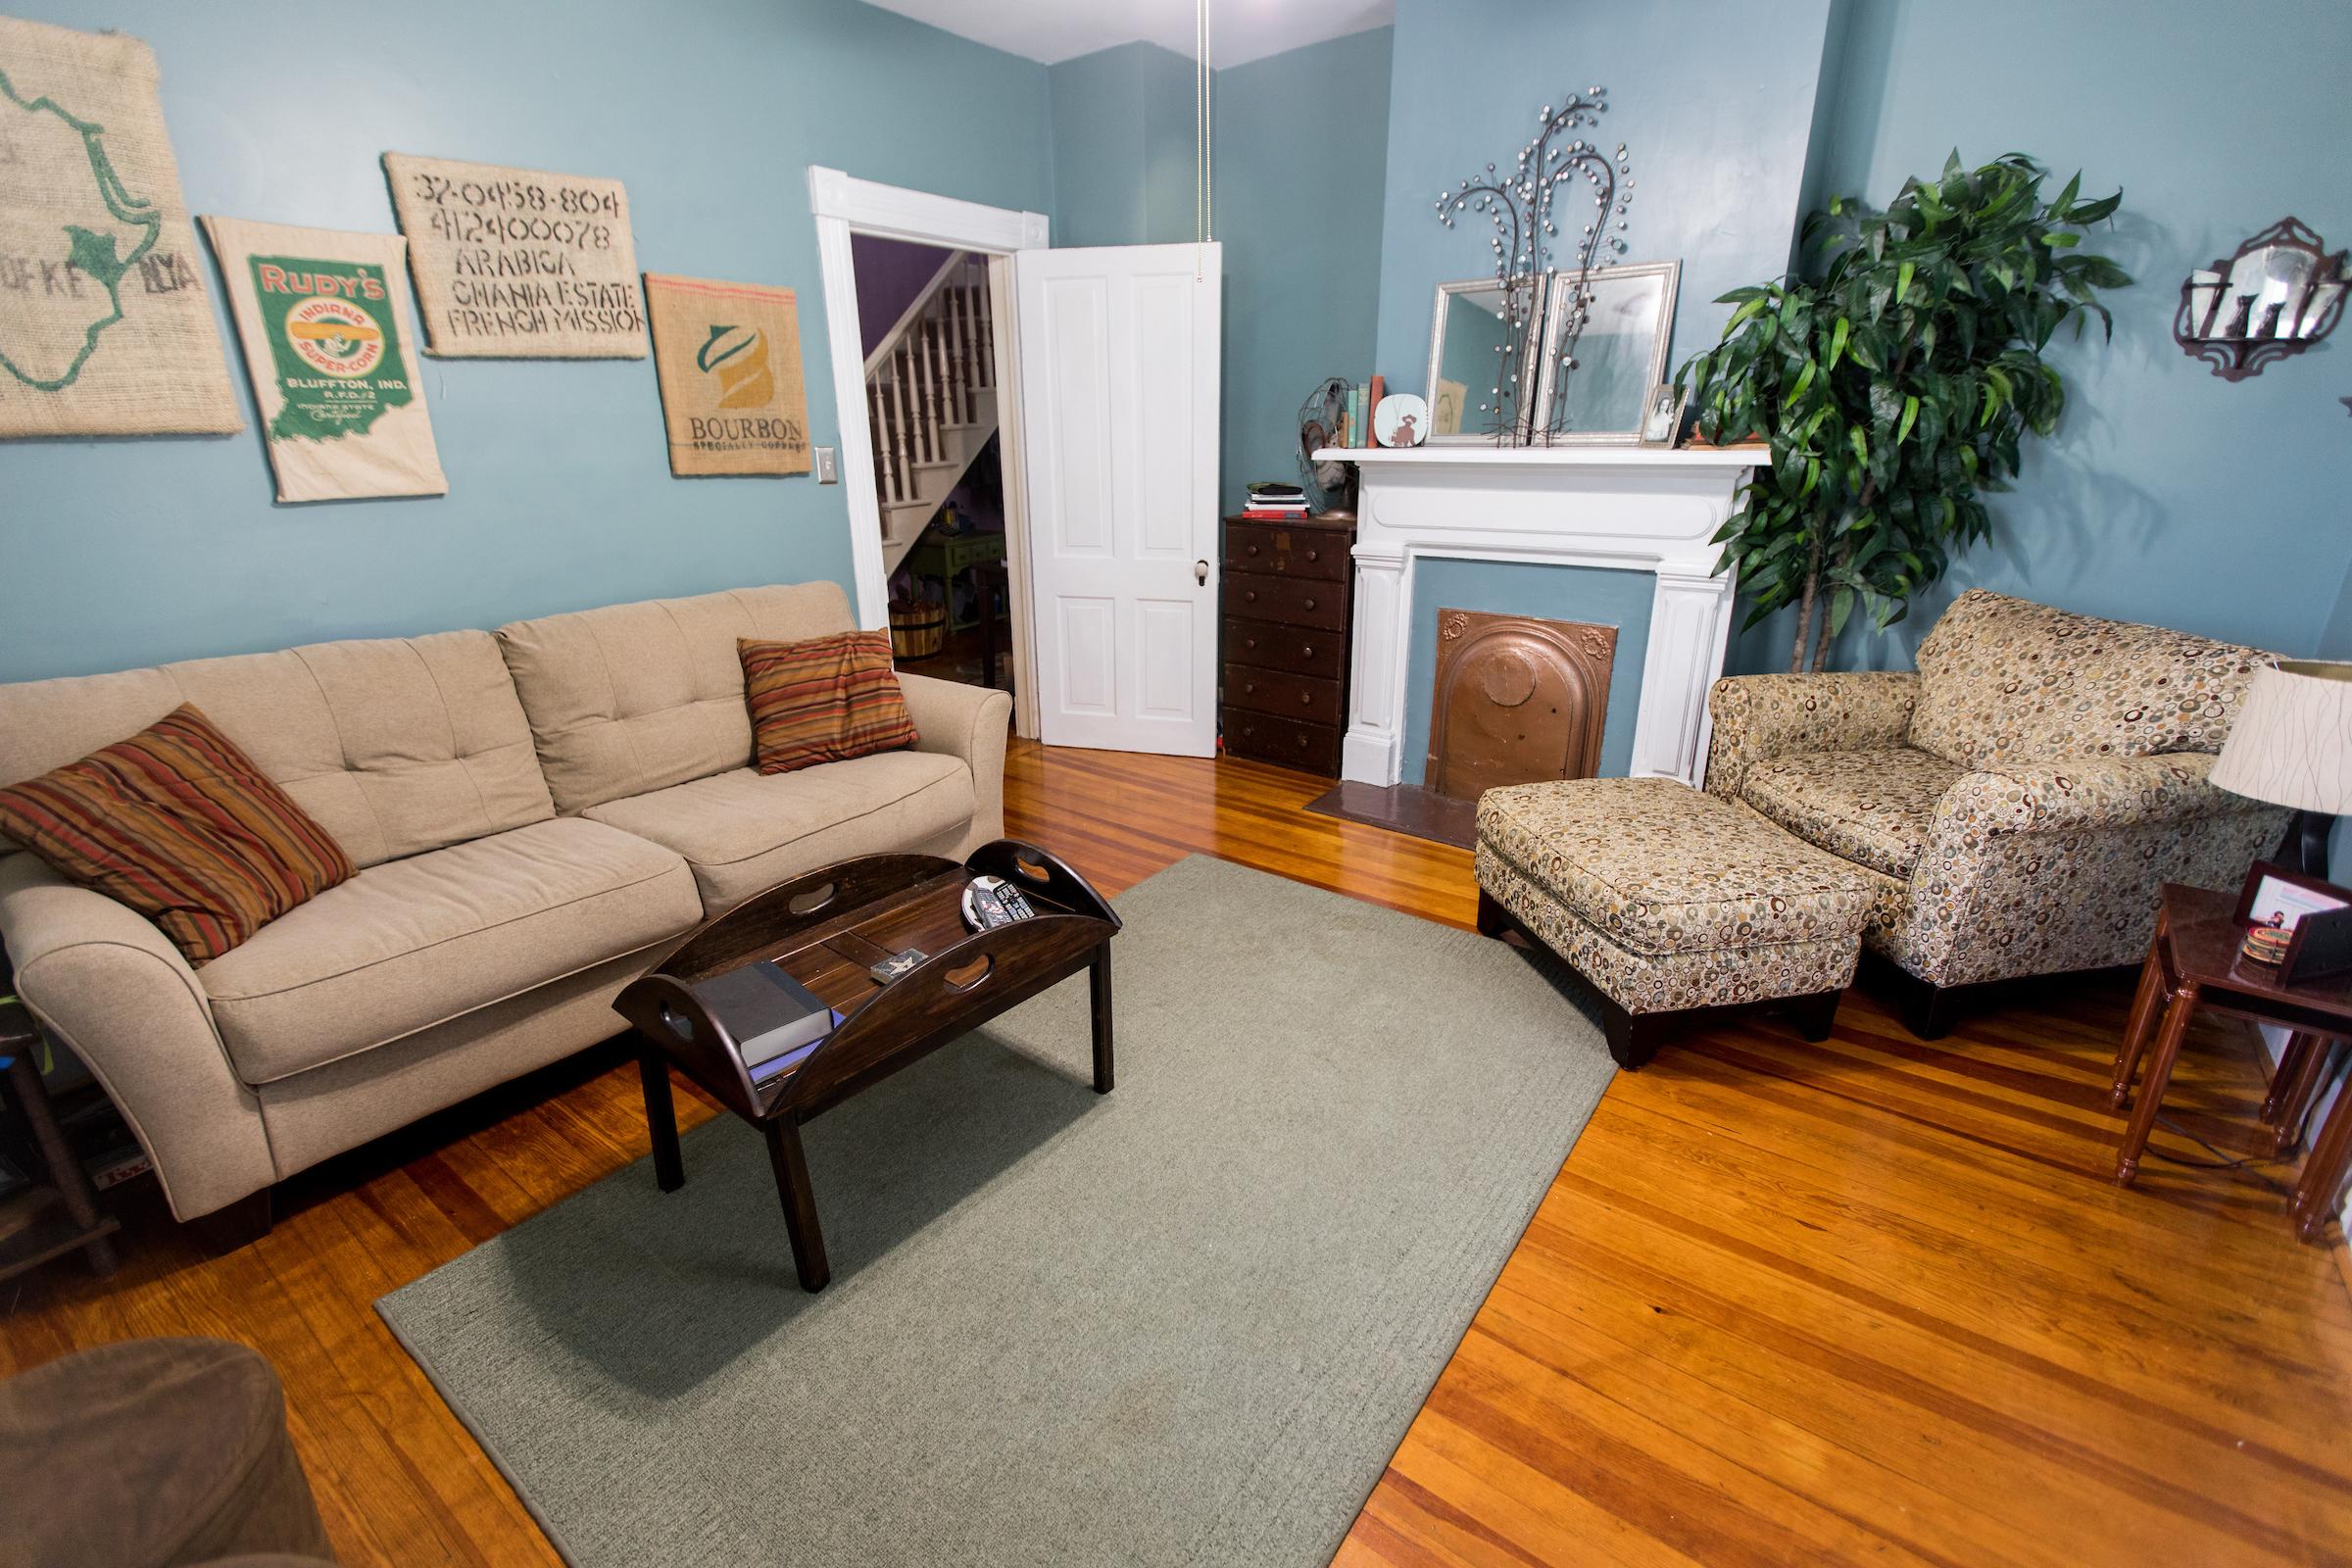 Waugh house 208 F St 015.jpg